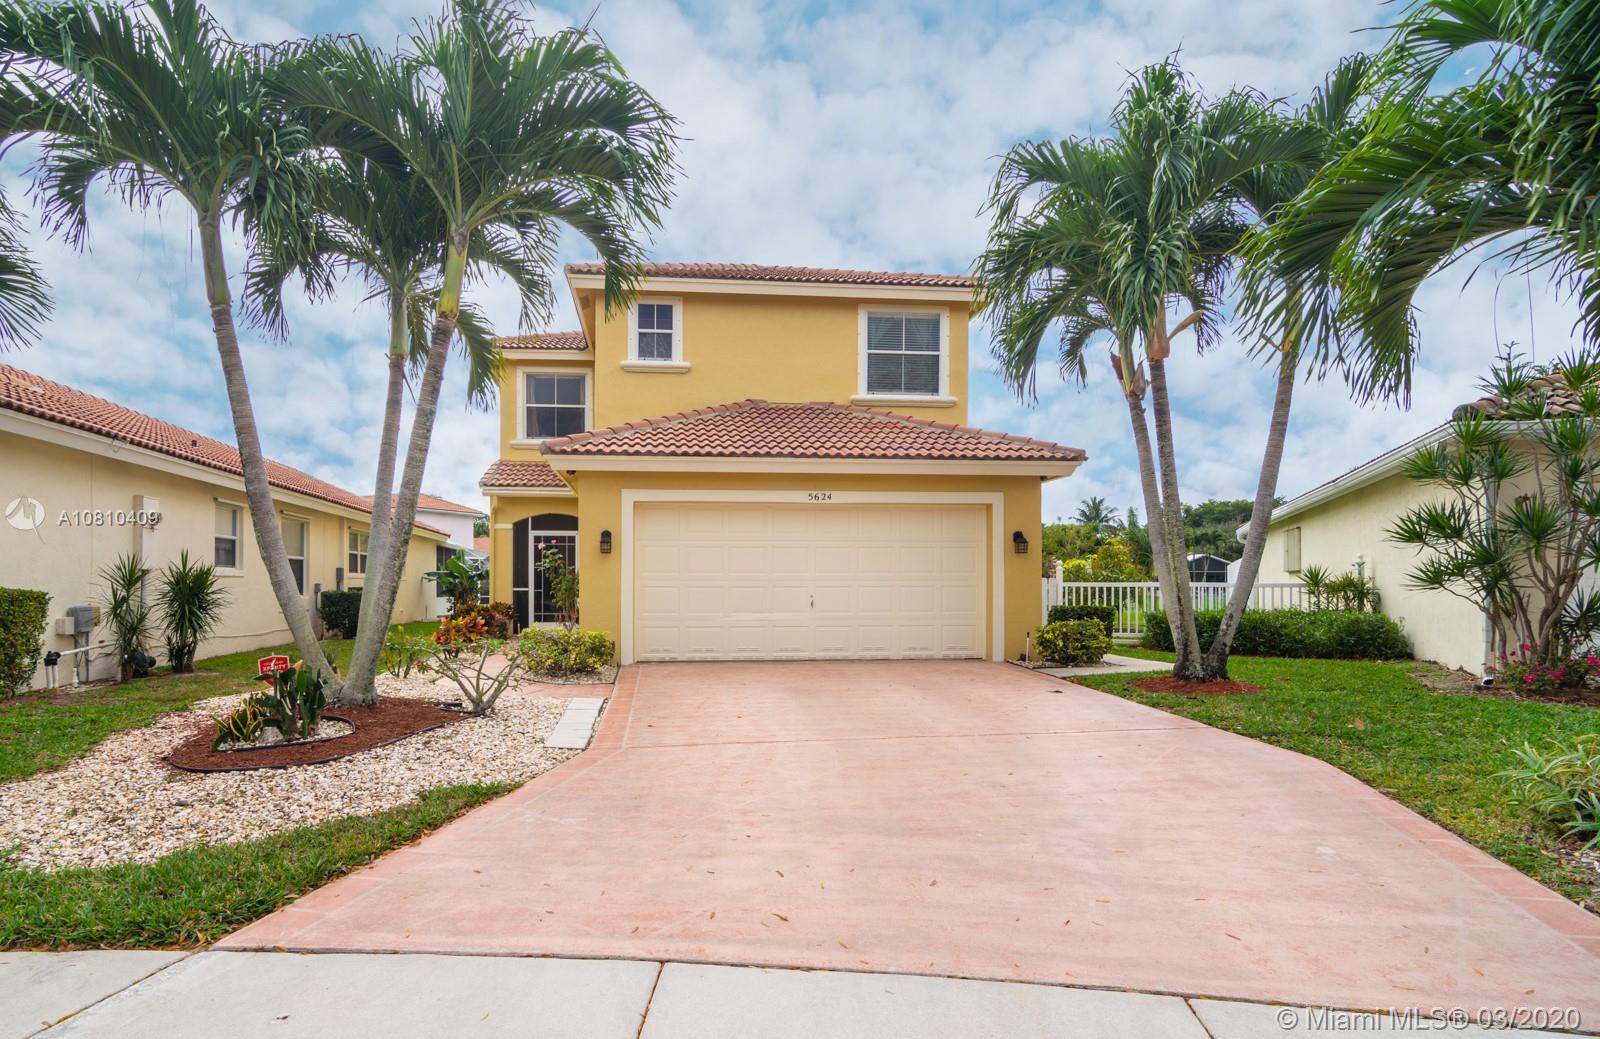 5624 Kingsmill Ct, Lake Worth, FL 33463 - Lake Worth, FL real estate listing